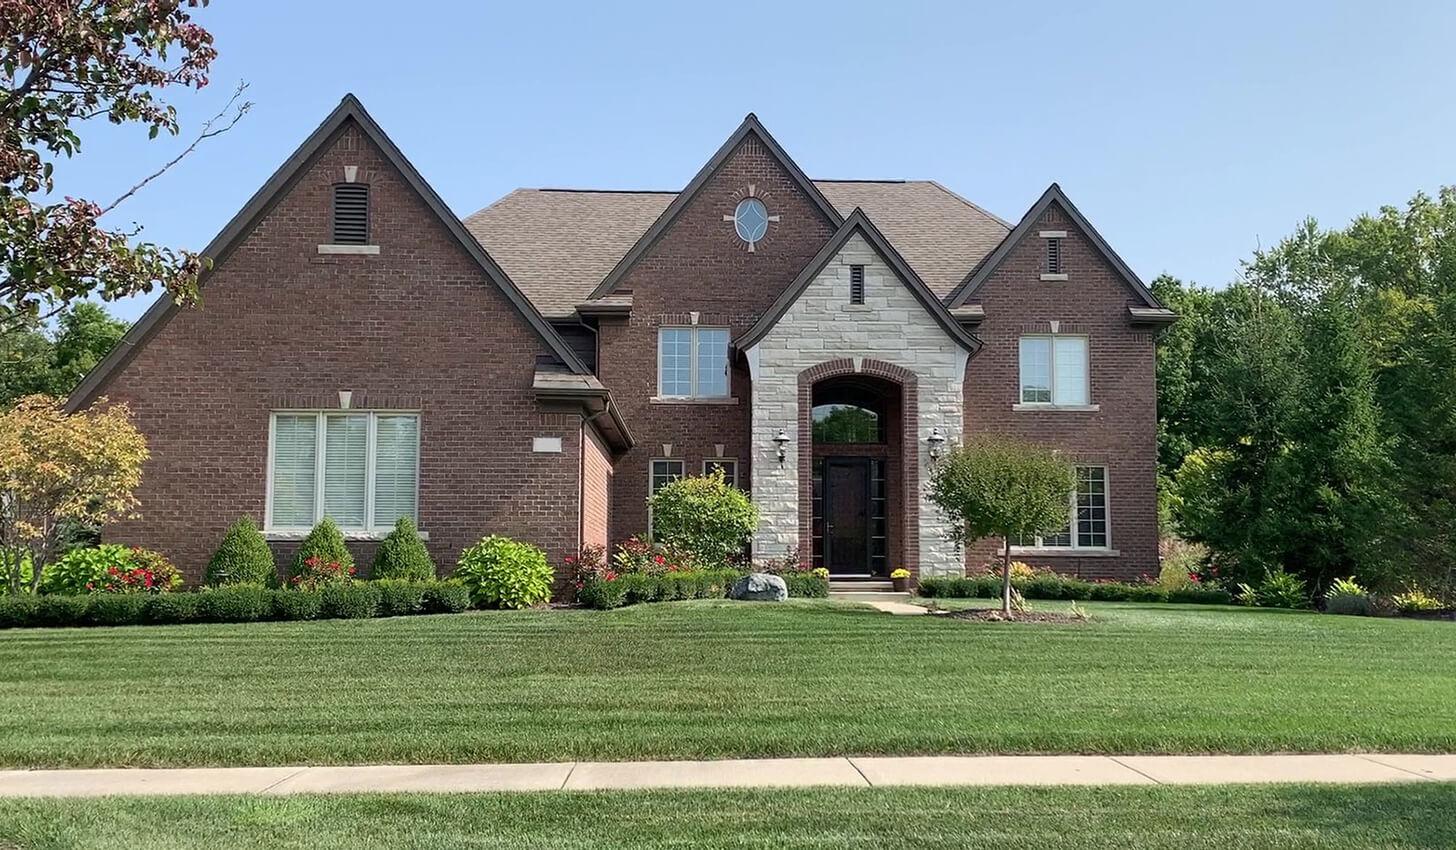 residential brick house